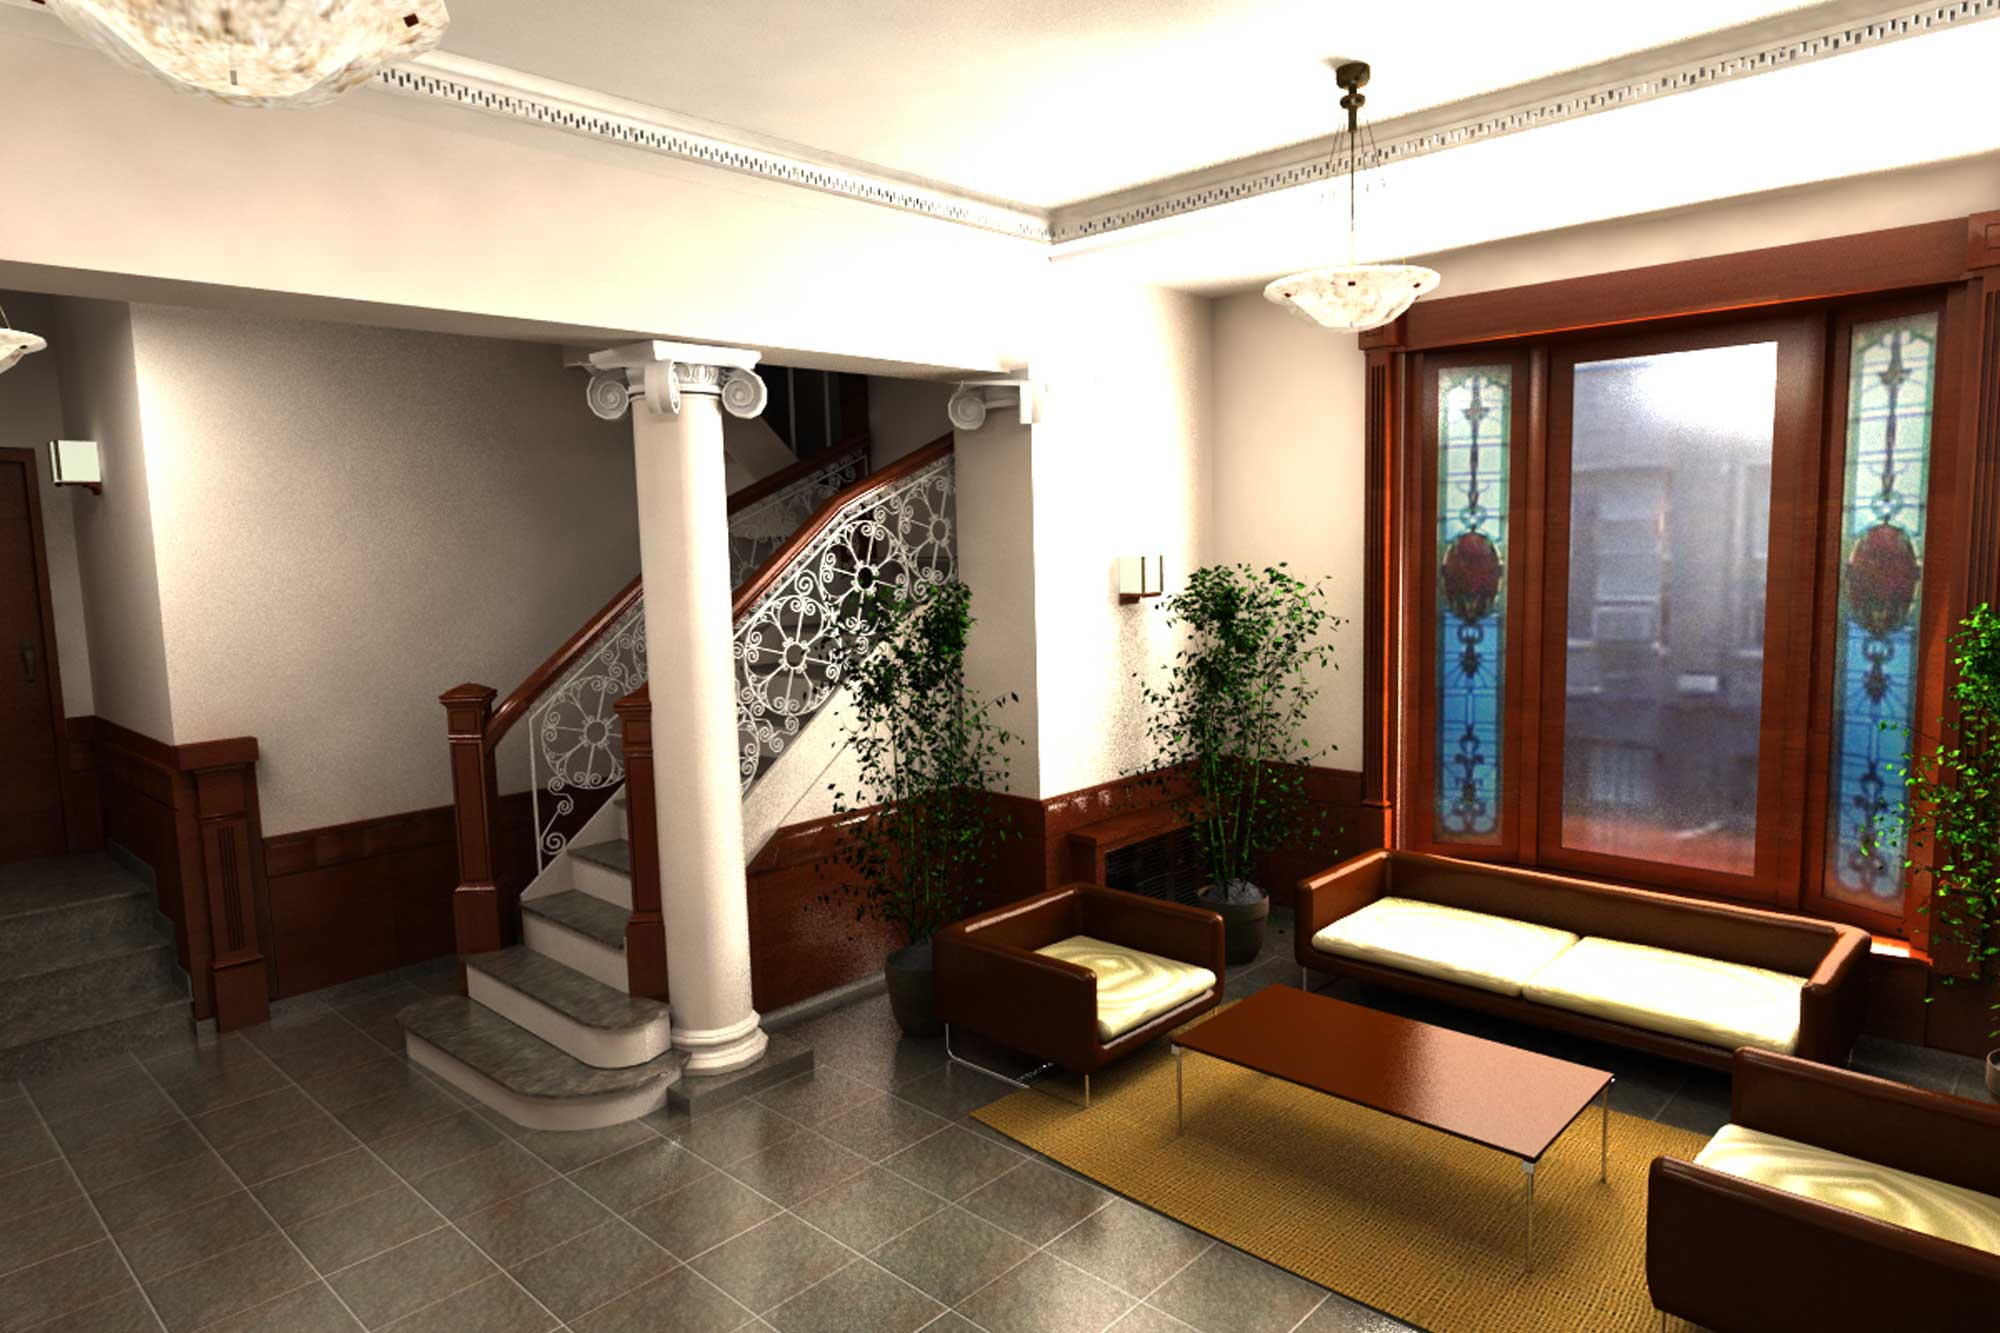 Architectural Rendering Interior River Hall Dormitory